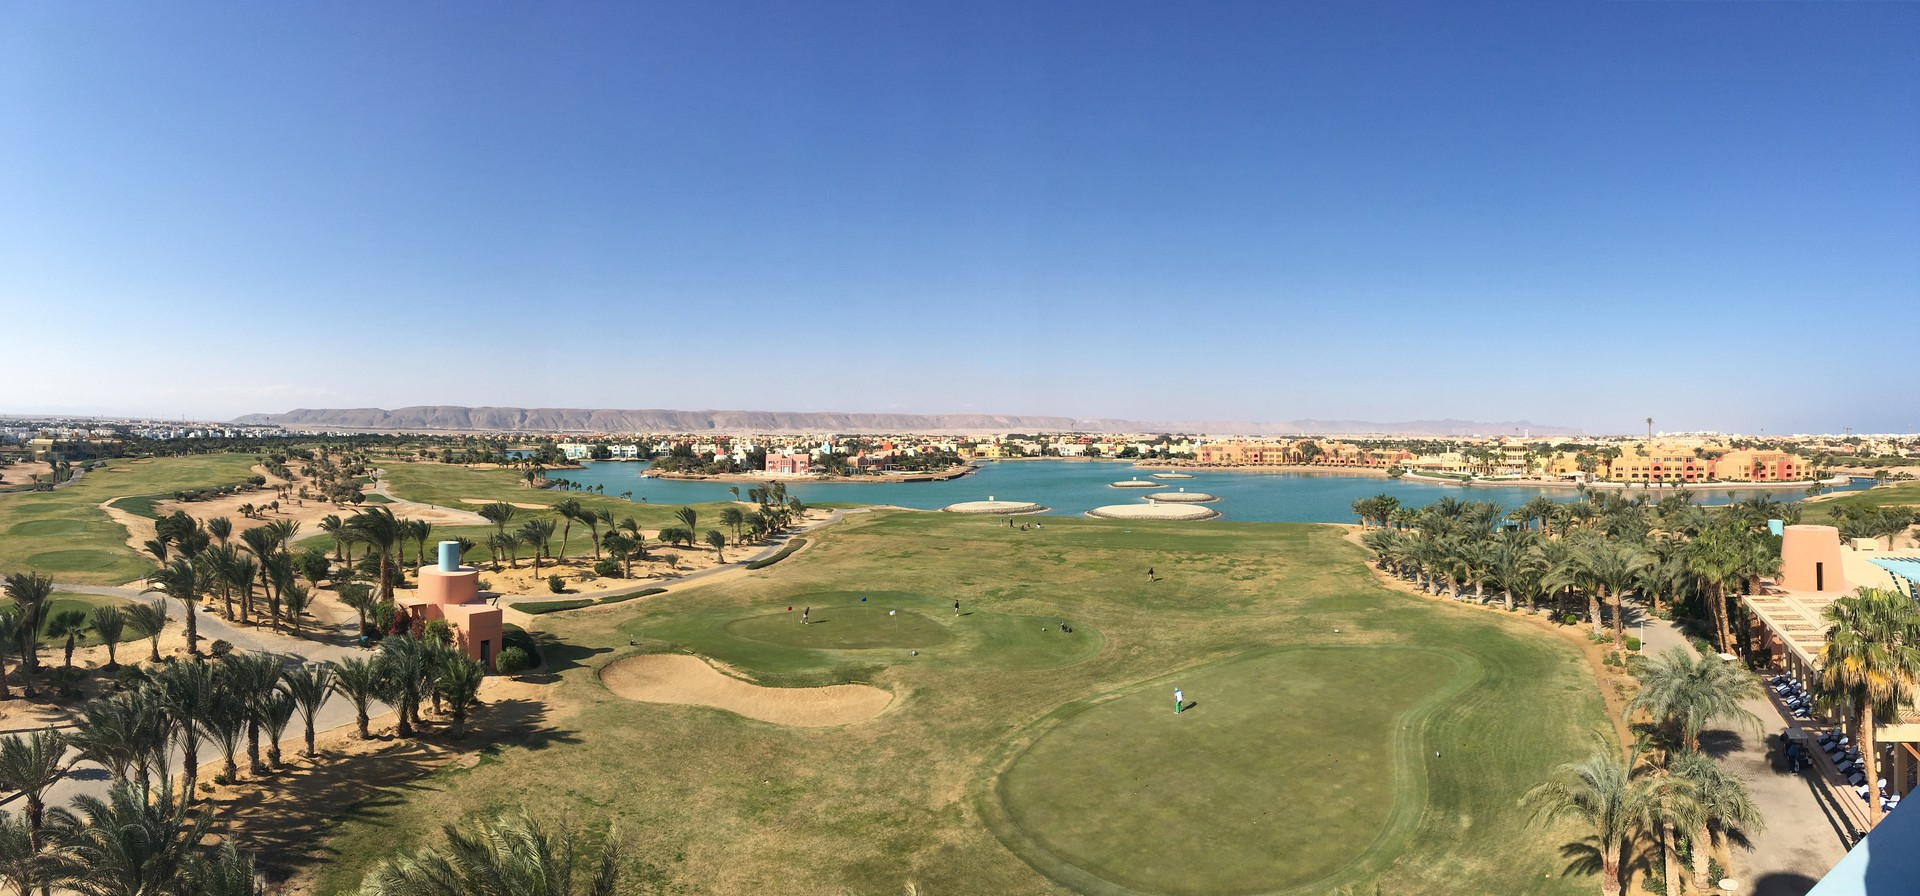 Reisebericht über Ägypten, El Gouna - Steigenberger Golfresort El Gouna